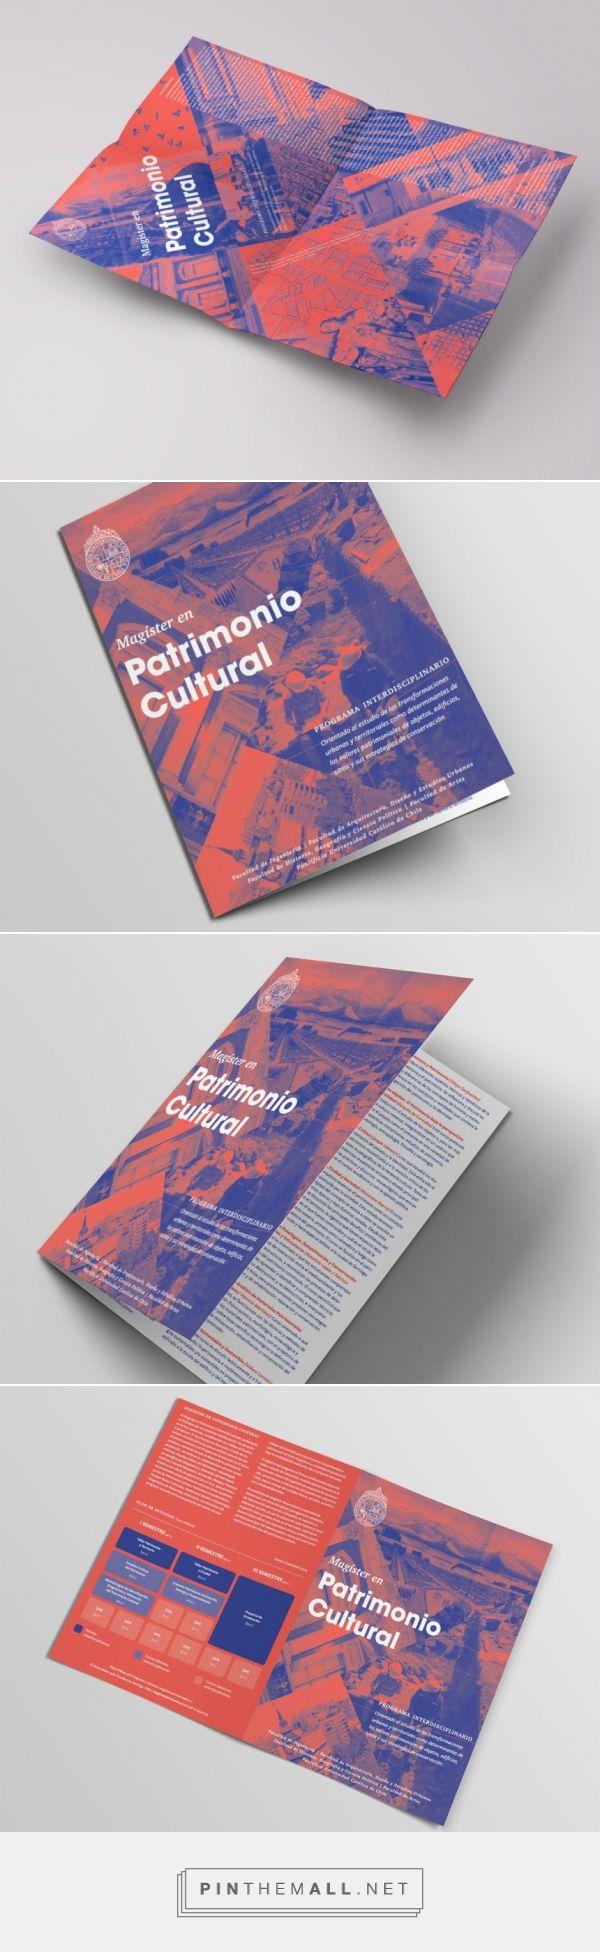 Poster Magister Patrimonio | Design by otrosperez.com  Design of a drop down poster for a Magister of Universidad Católica d Chile. - created via https://pinthemall.net